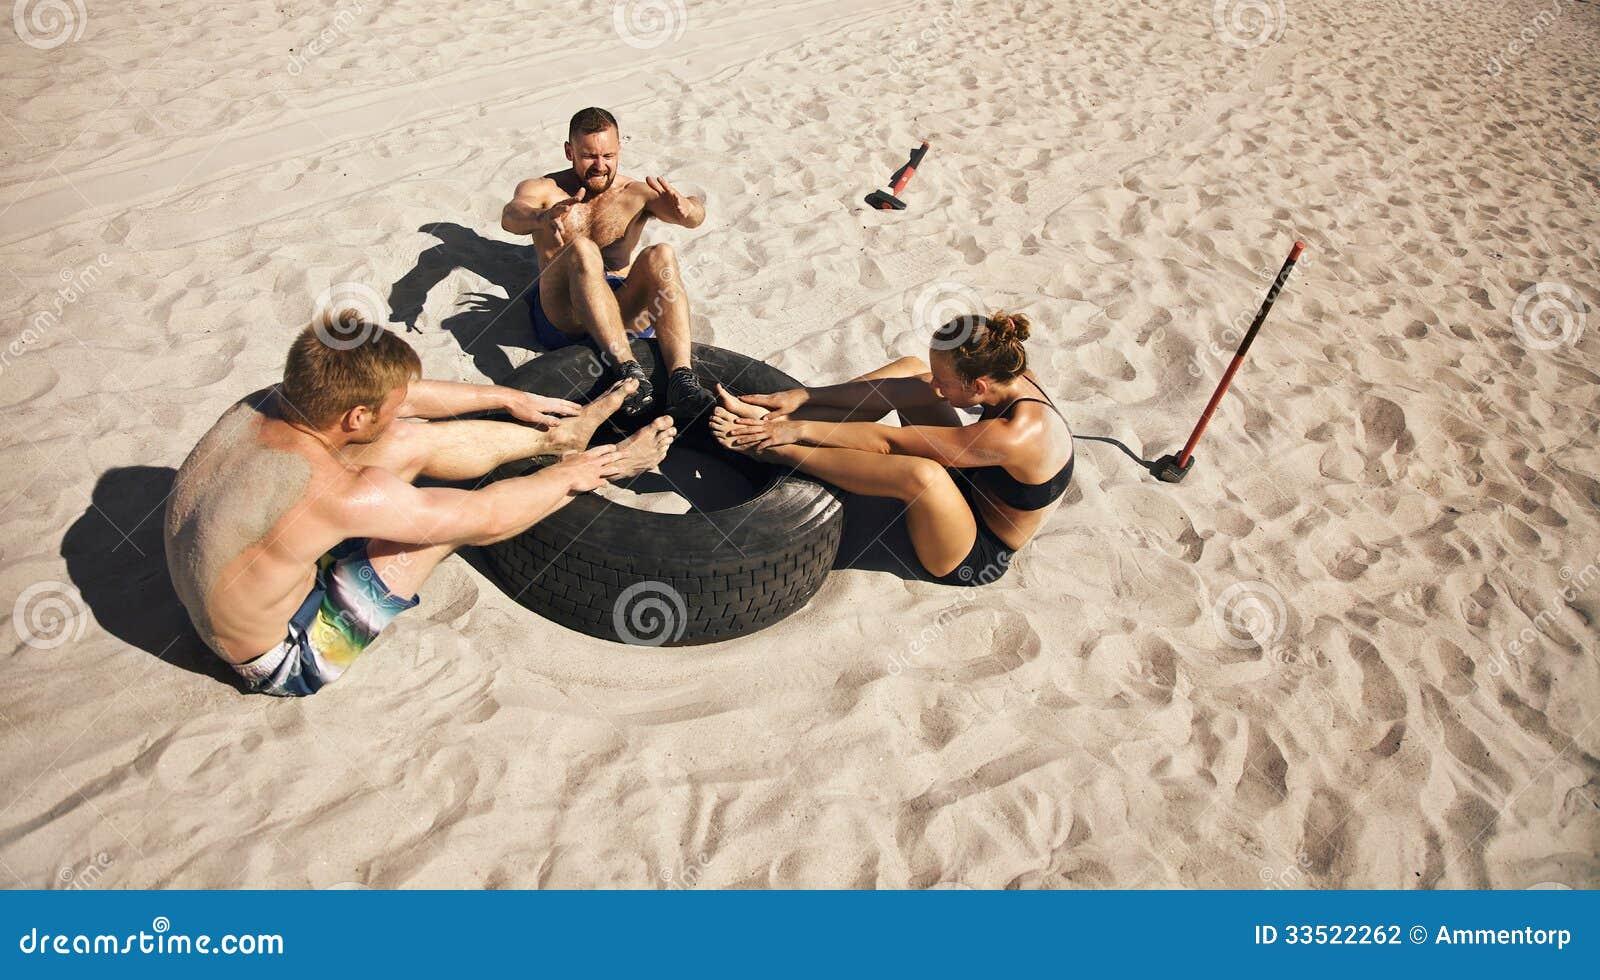 athletes lifestyle Thesportslifestyleca, the sports lifestyle, sports handicapping, live sports odds, live sports lines, sports wagering, baseball picks, hockey picks, football picks.